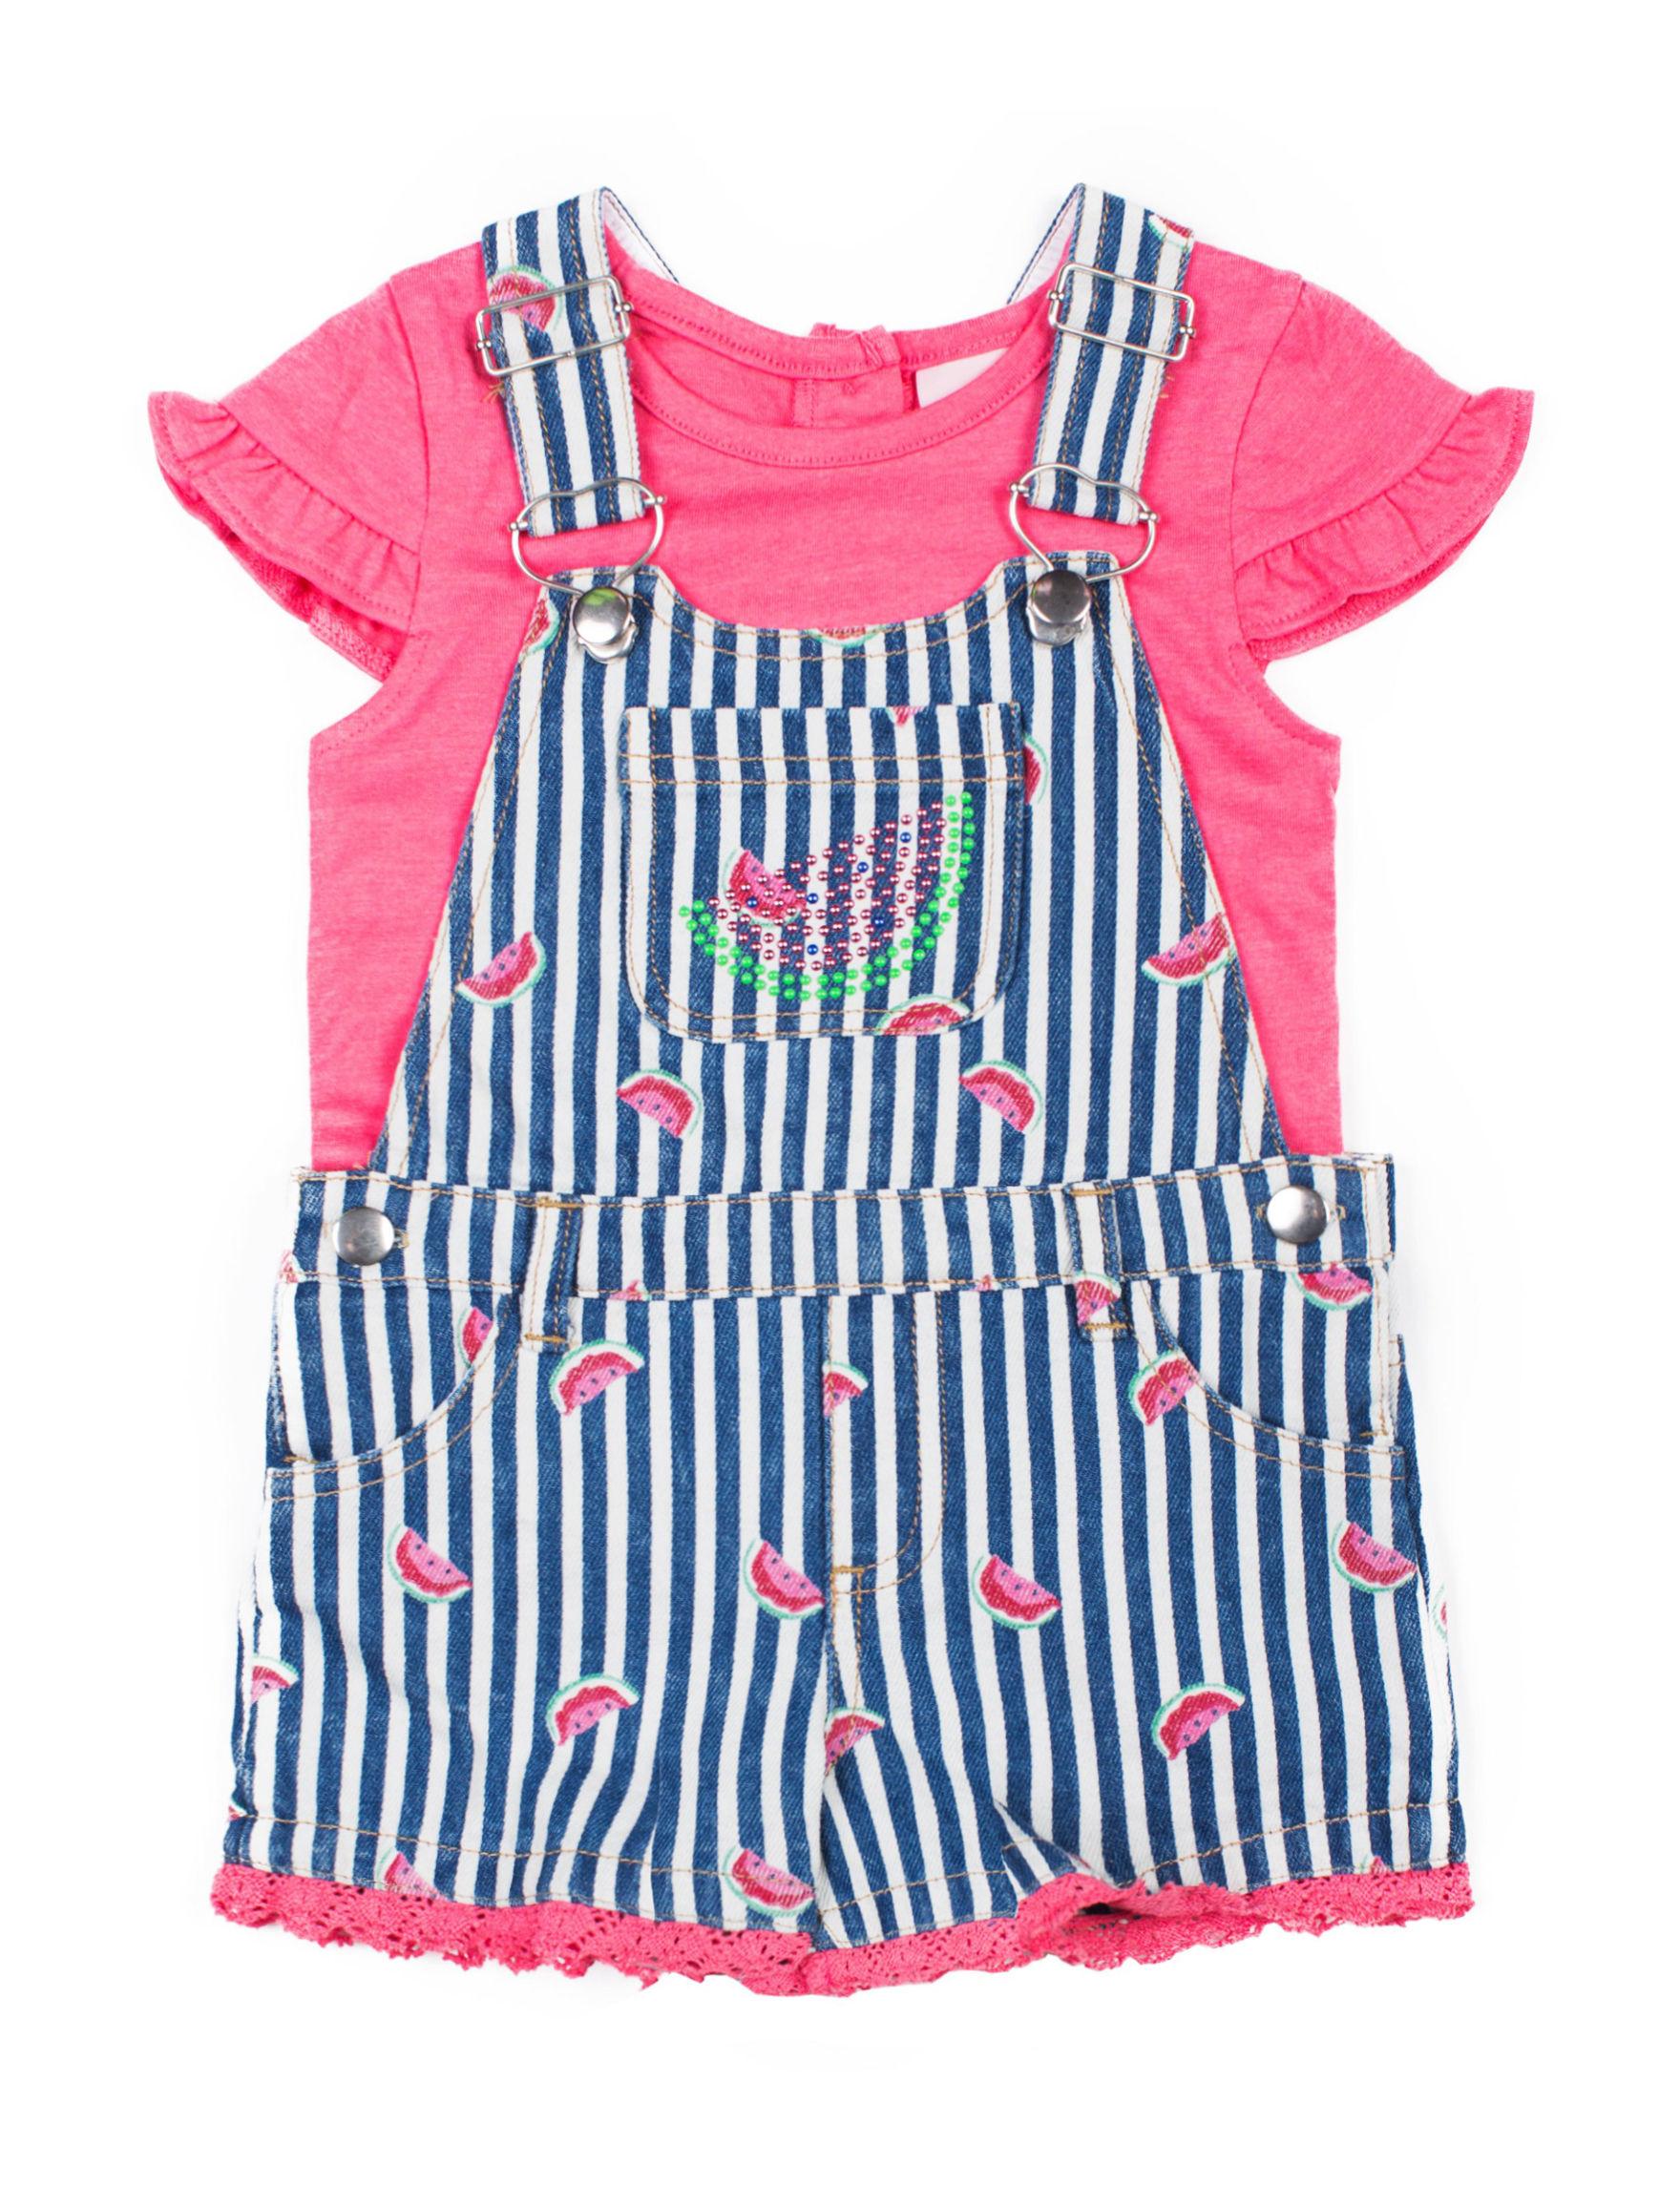 Little Lass Navy / White / Pink